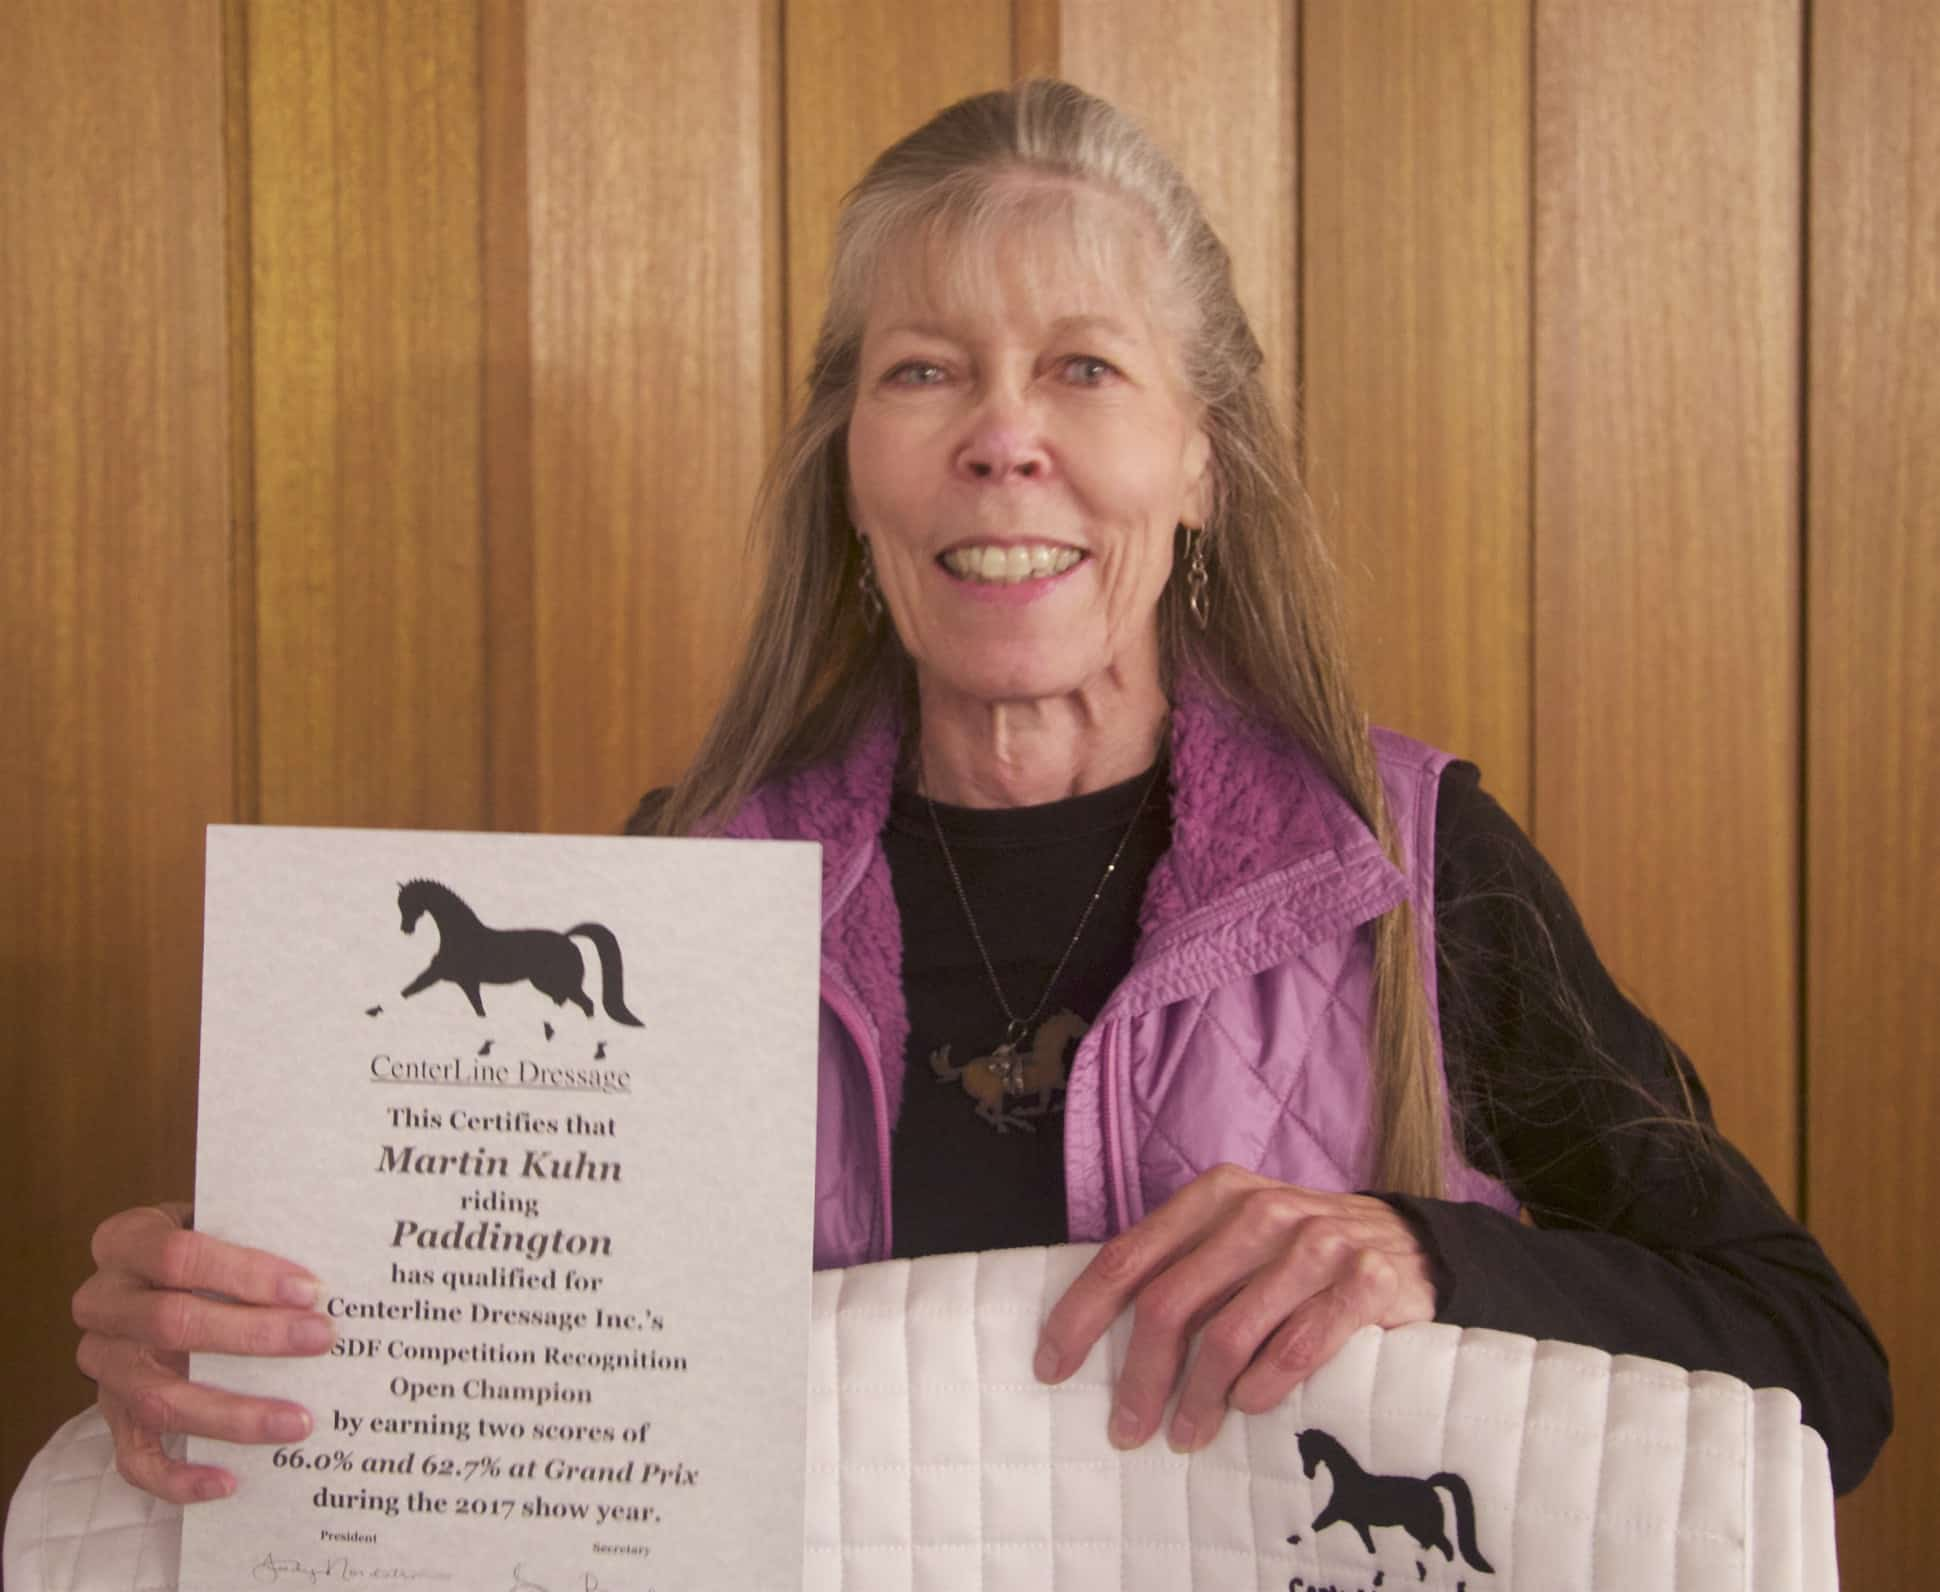 Leslie Burket accepts an award